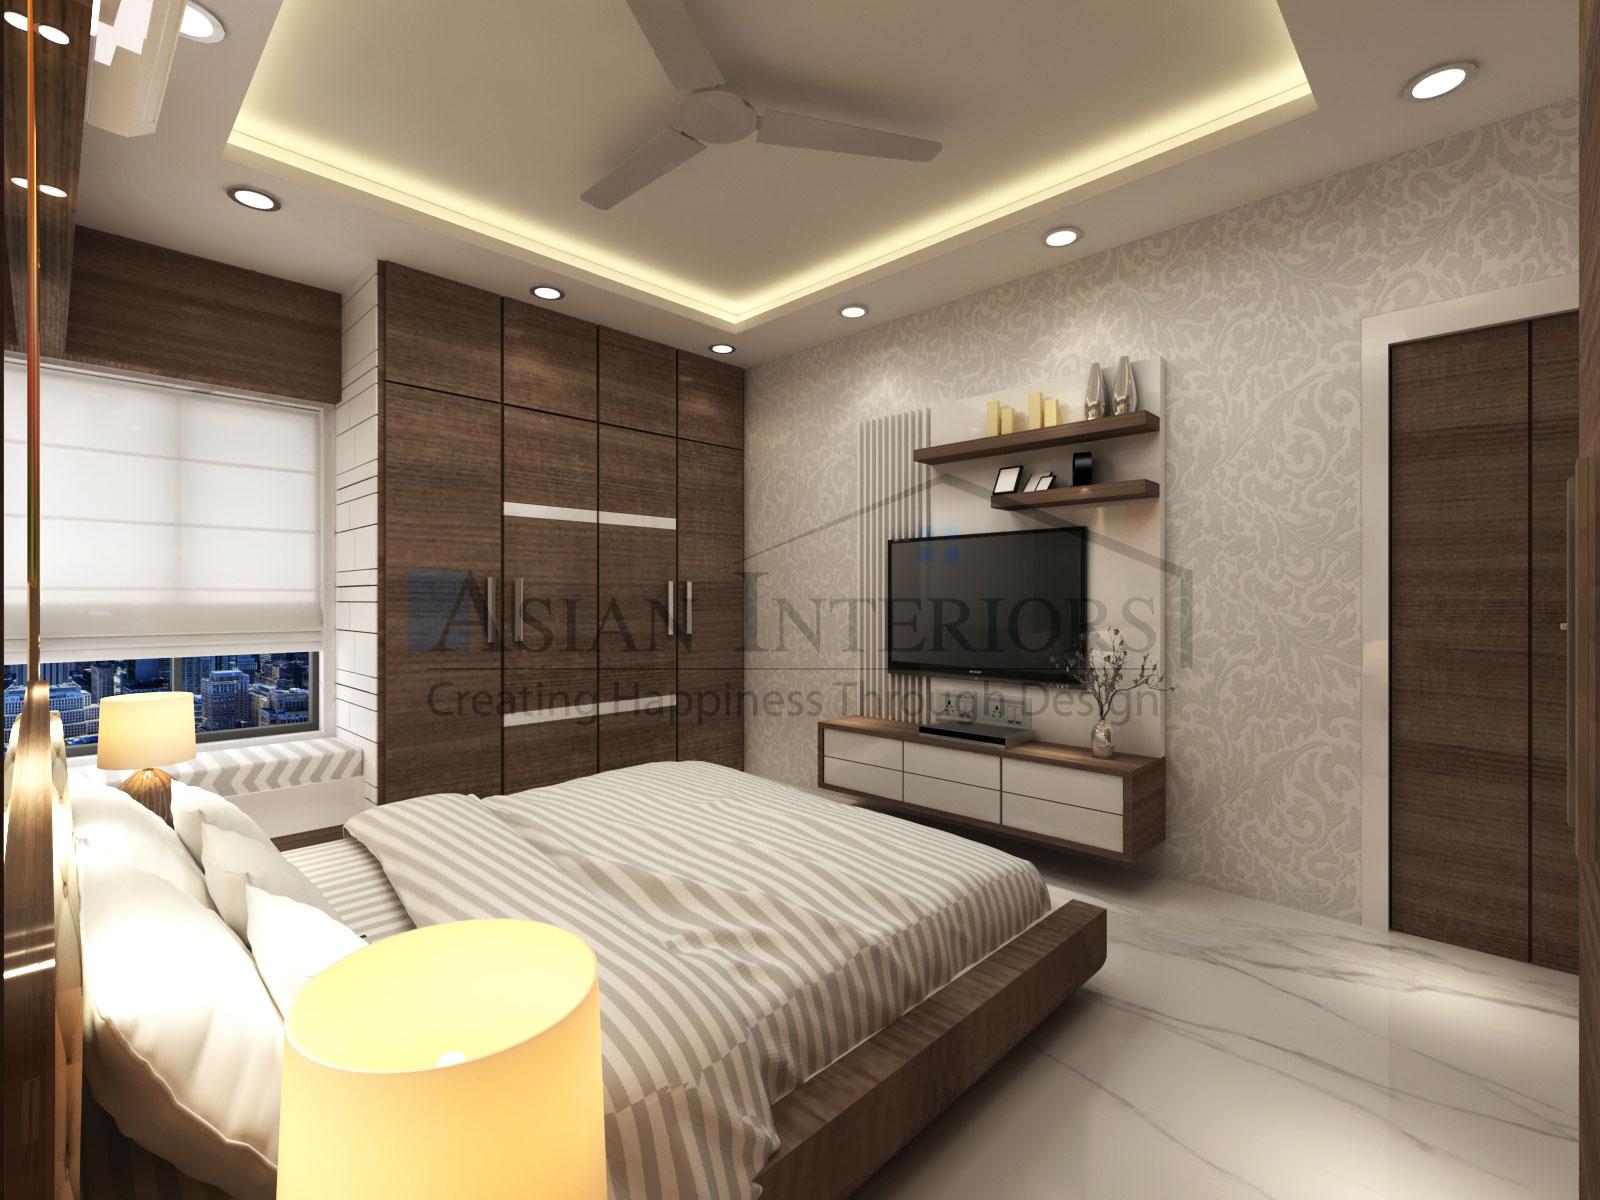 Asian-Interiors-BedRoom4